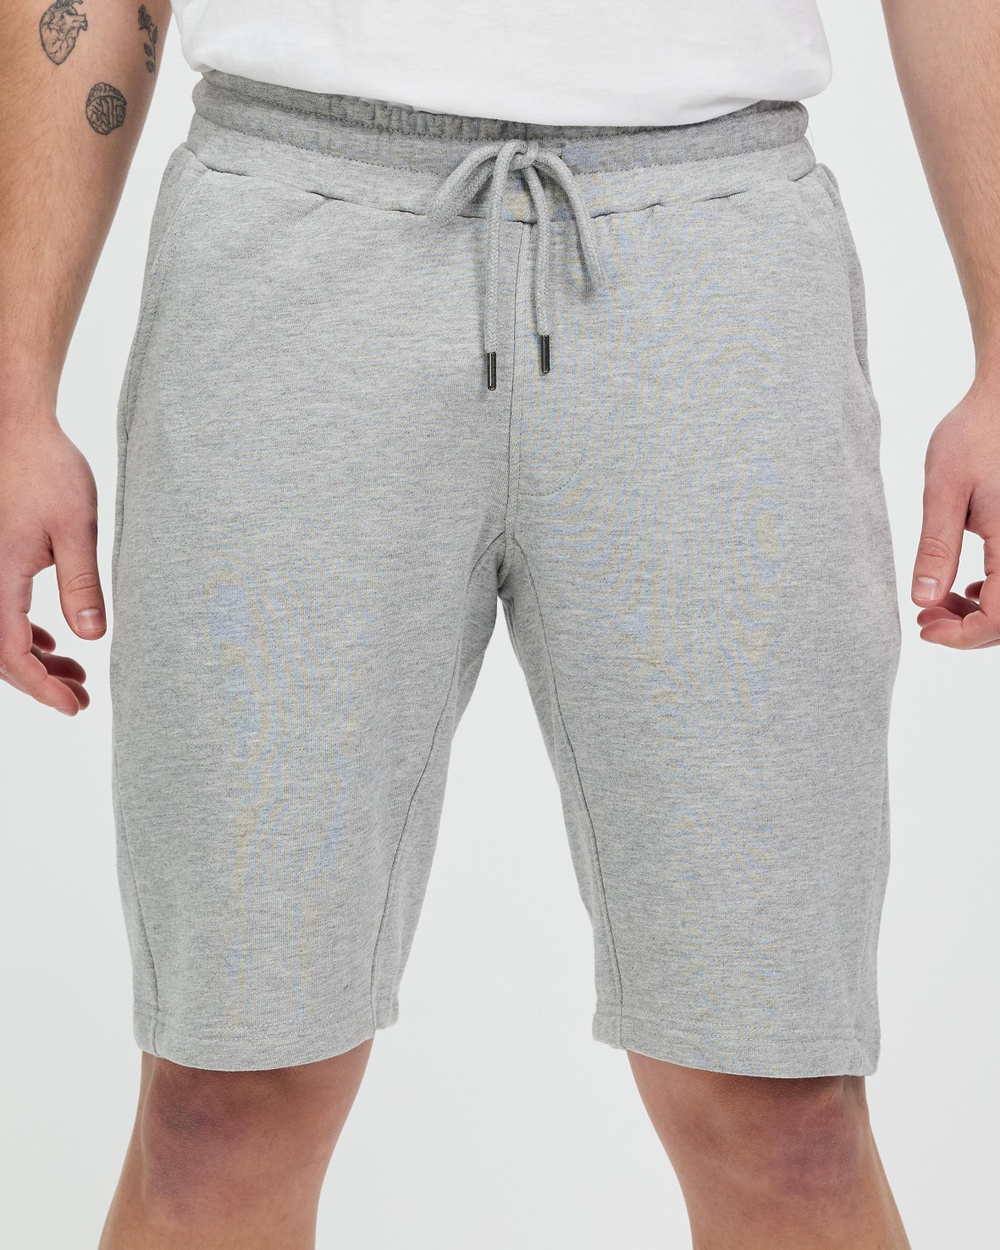 4blabel Lounge Shorts Grey Marle